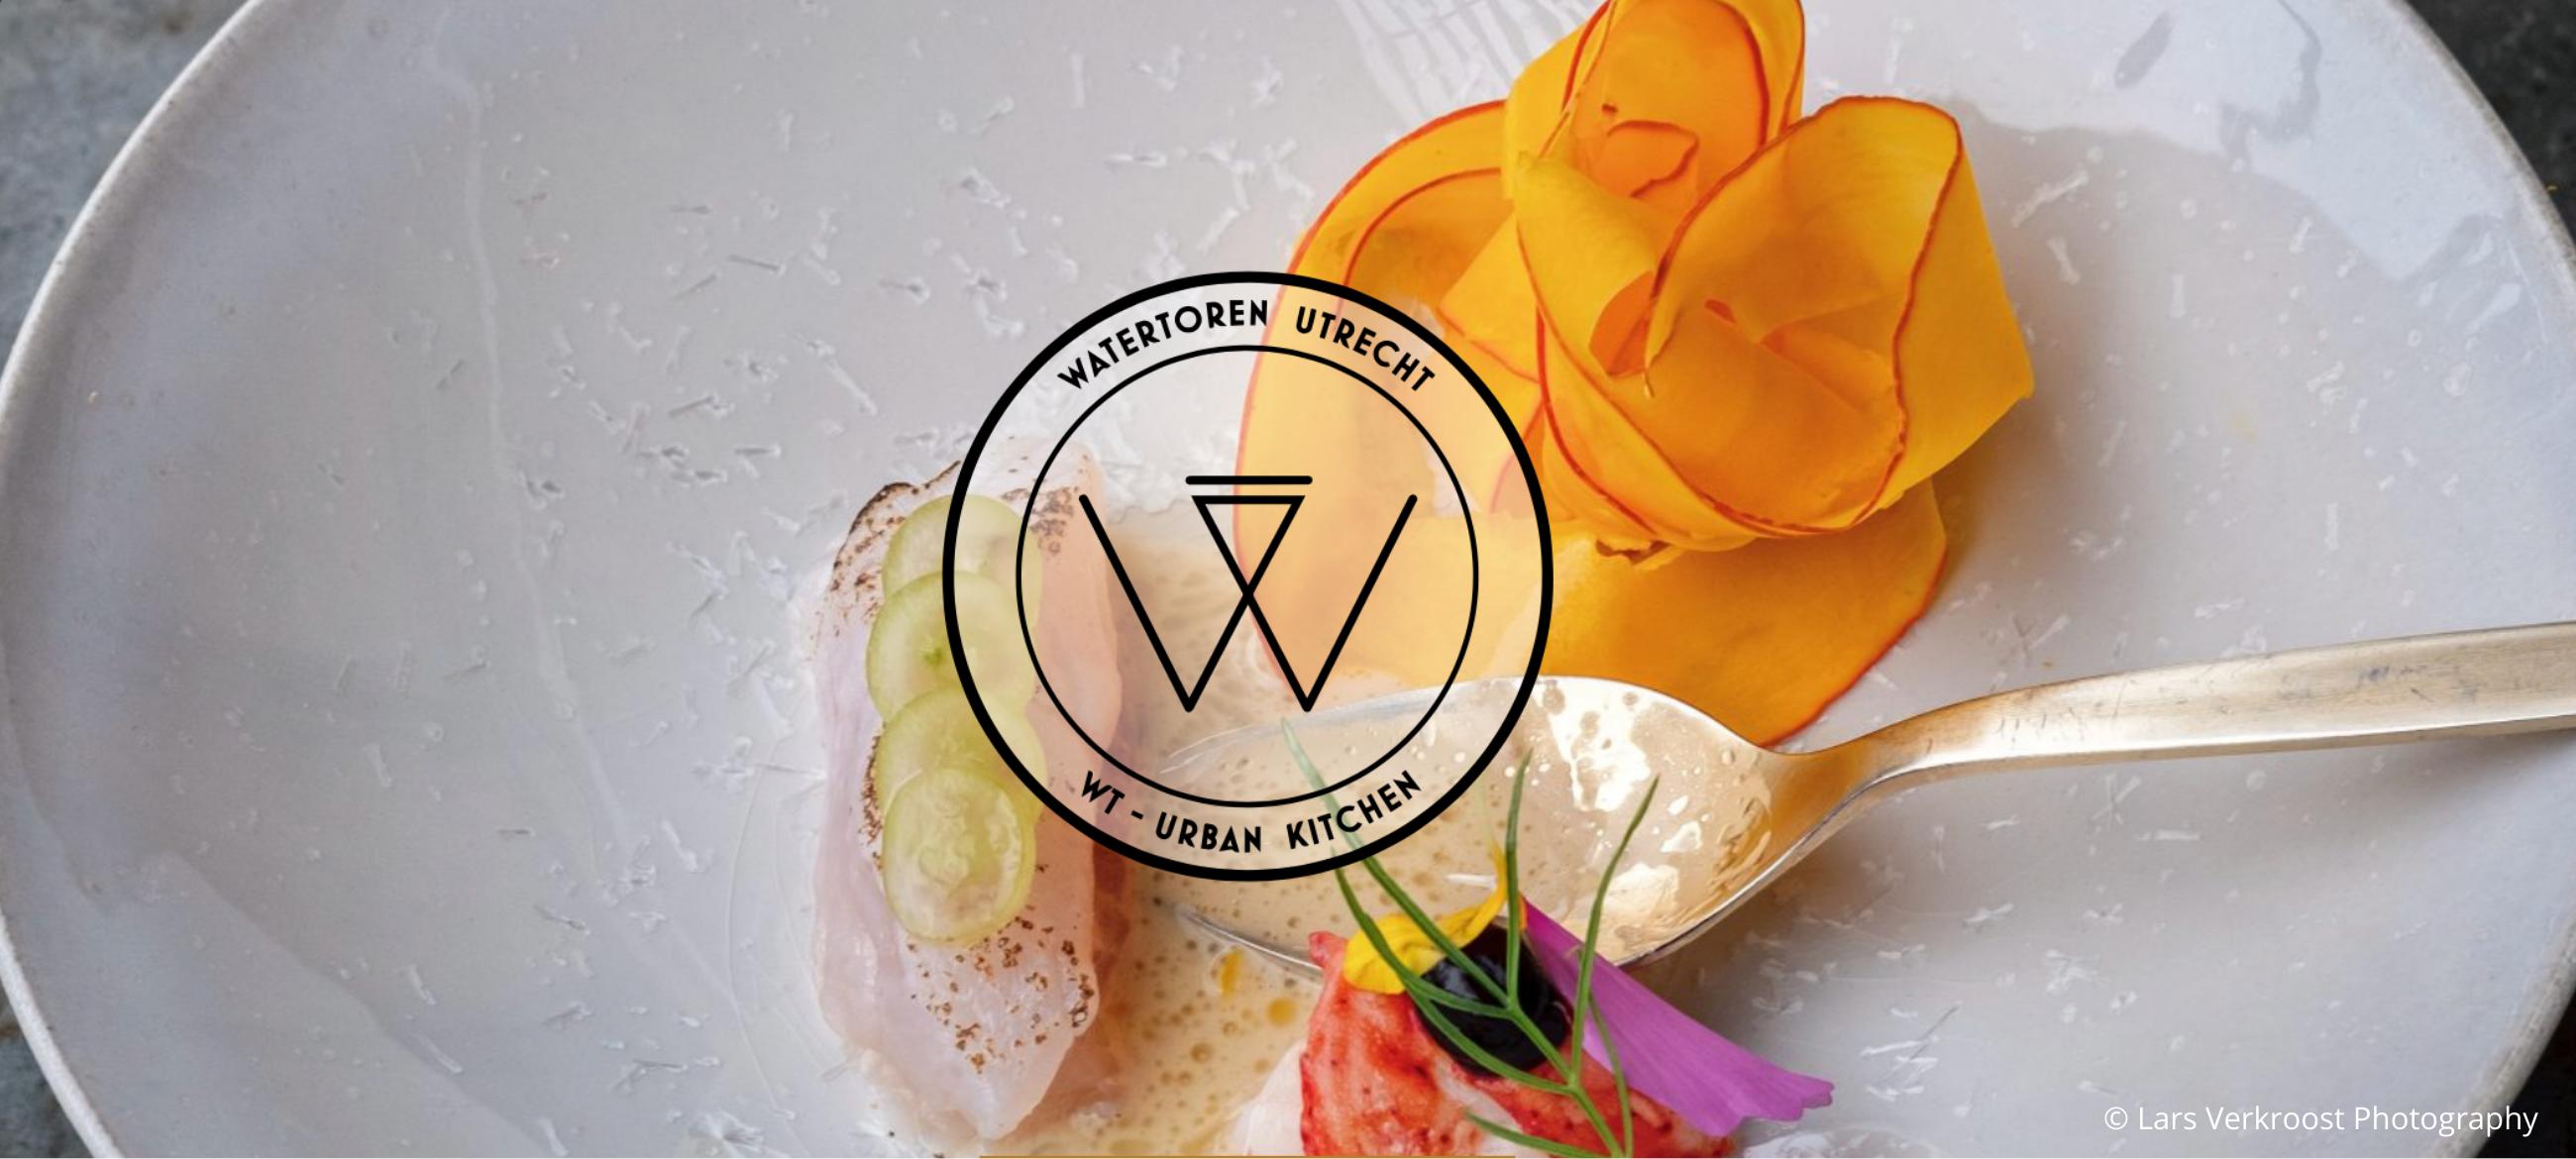 Modefabriek Must Eat: WT Urban Kitchen, high-level dining in Utrecht